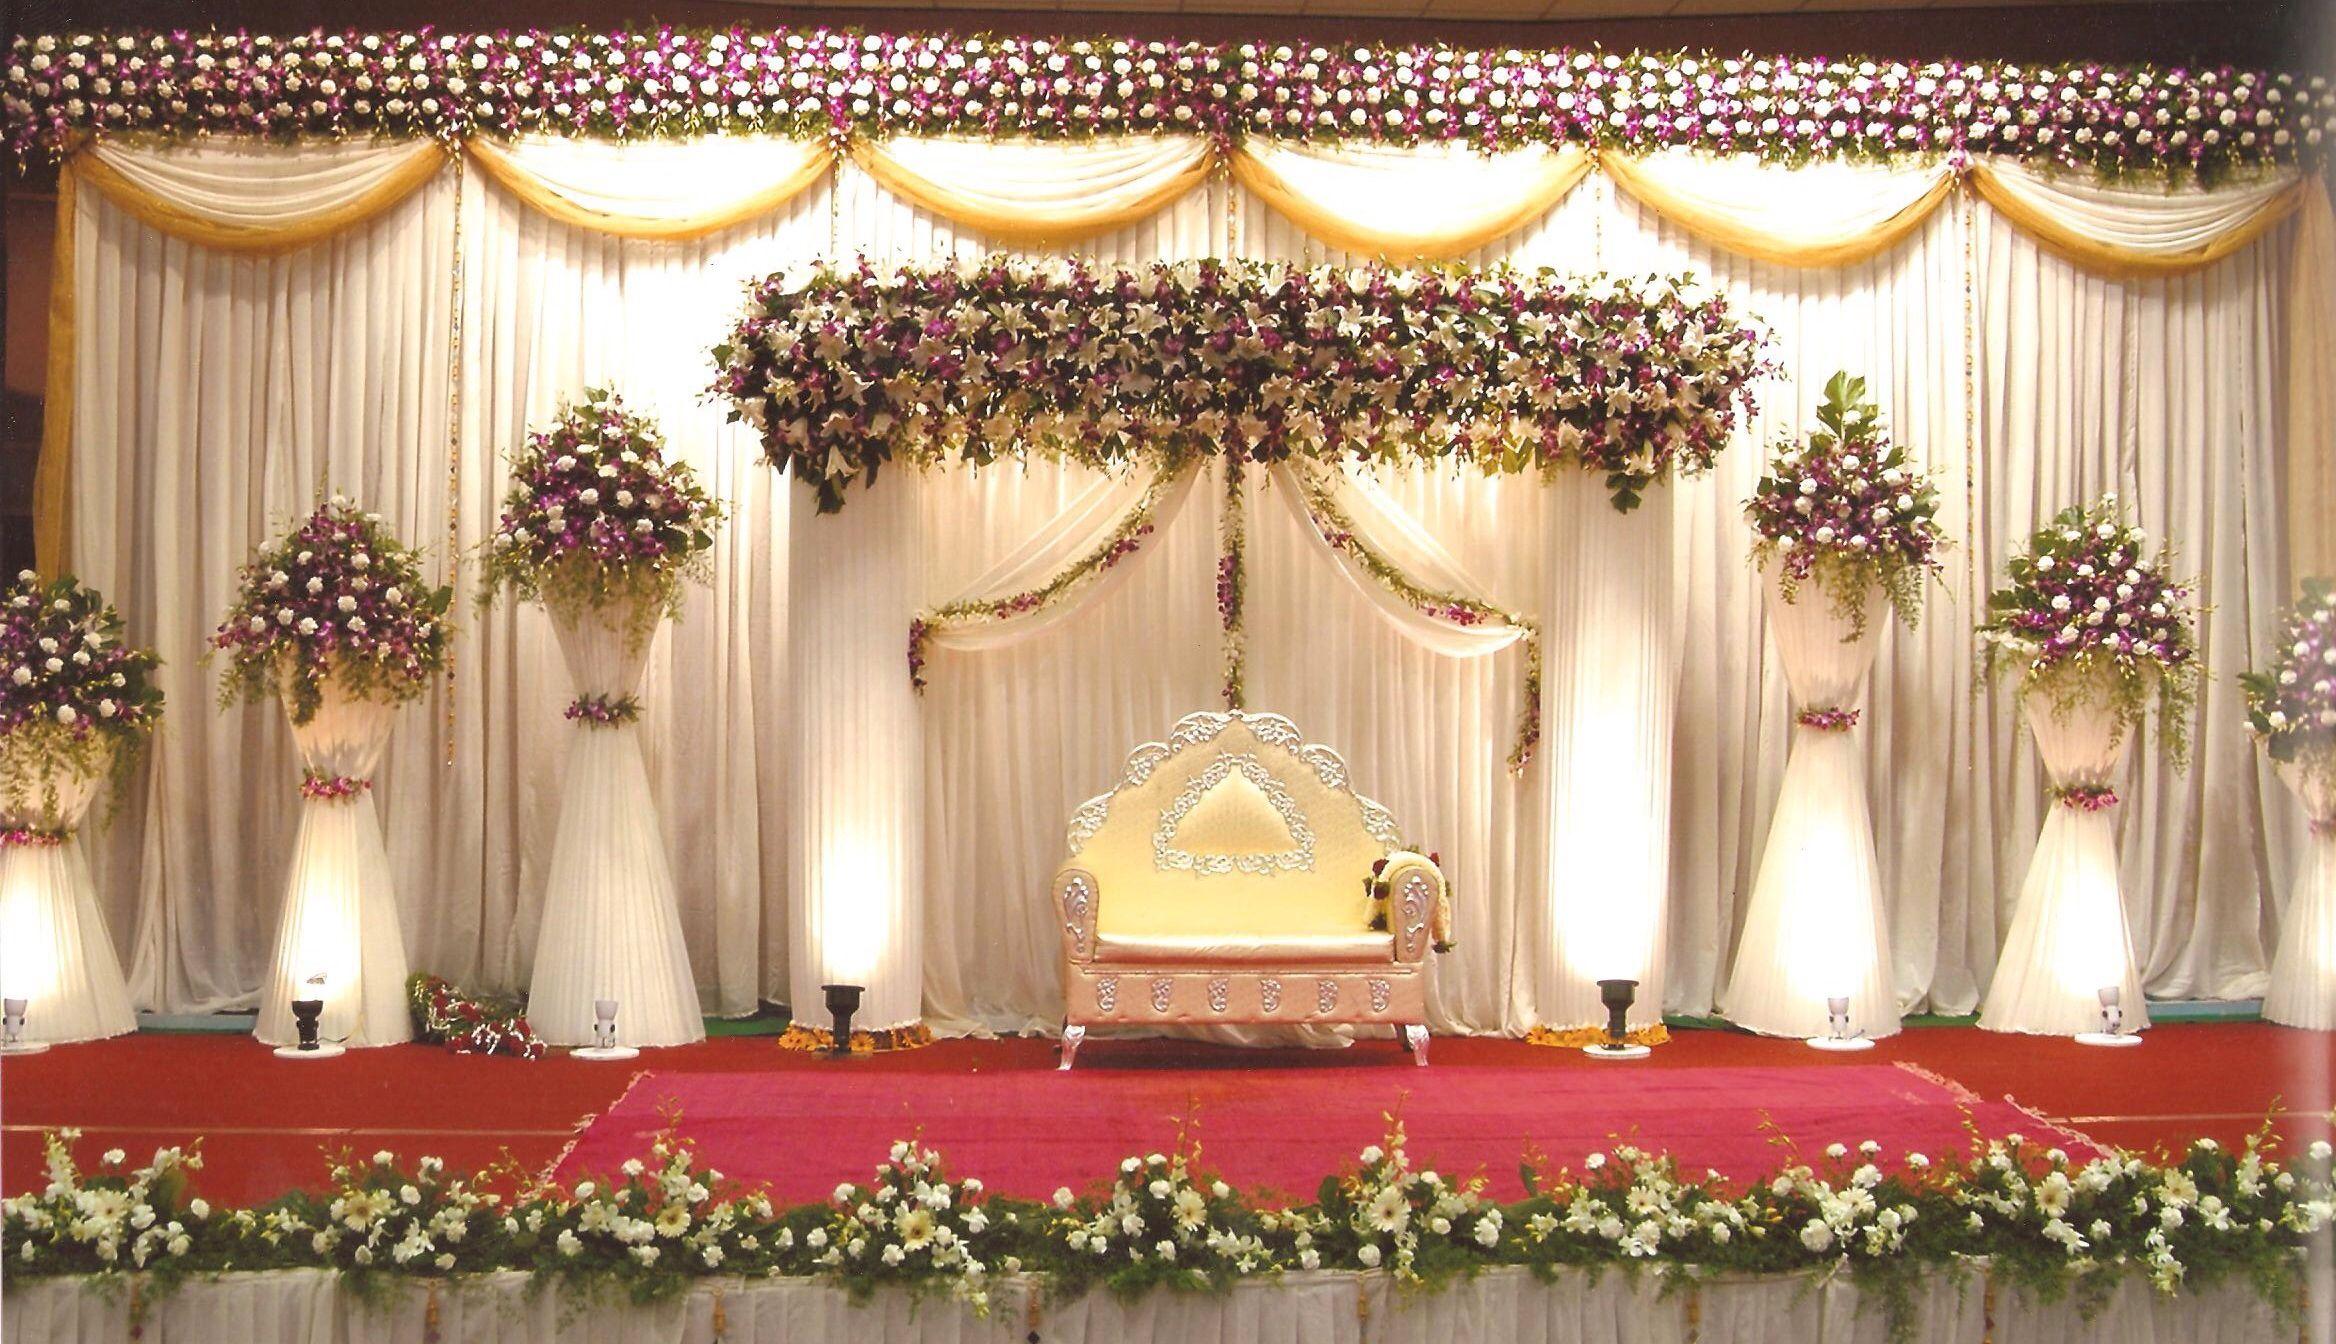 stage flower decoration photos,